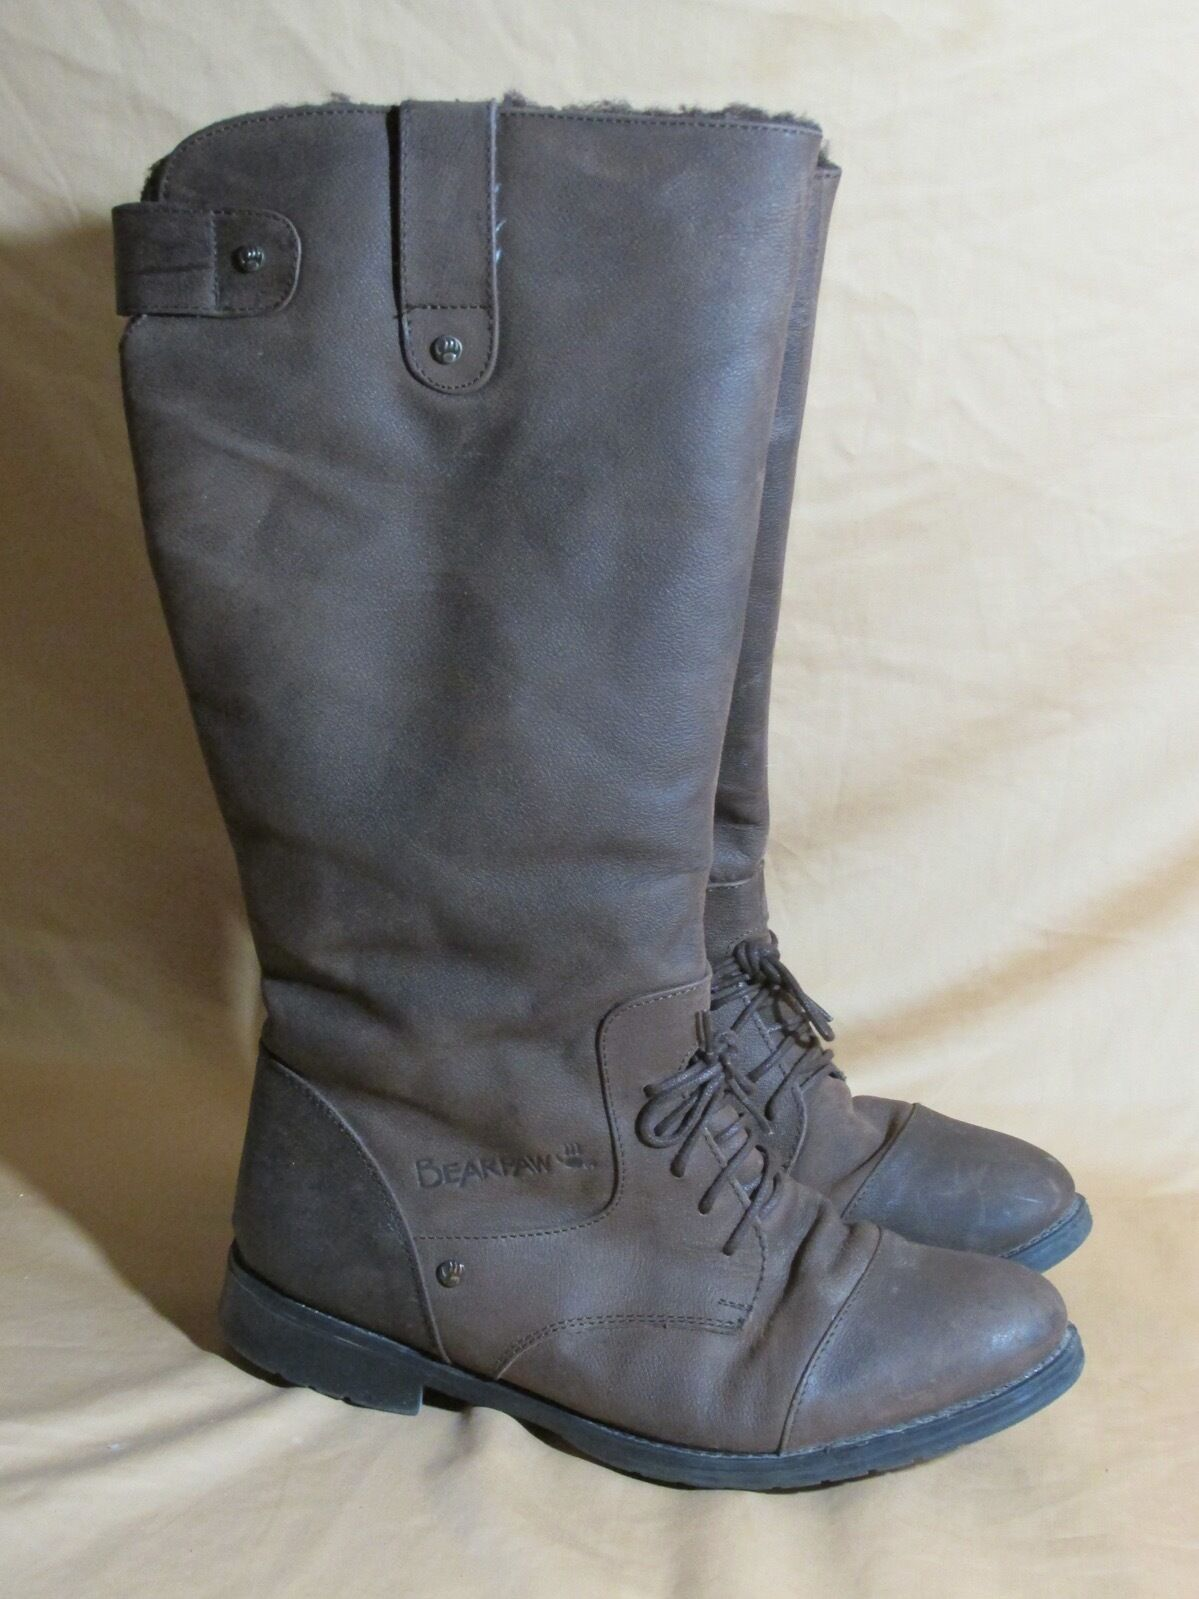 damen's Bearpaw Leather Riding Stiefel Wool Lining - Sheepskin Footbed braun Sz 10